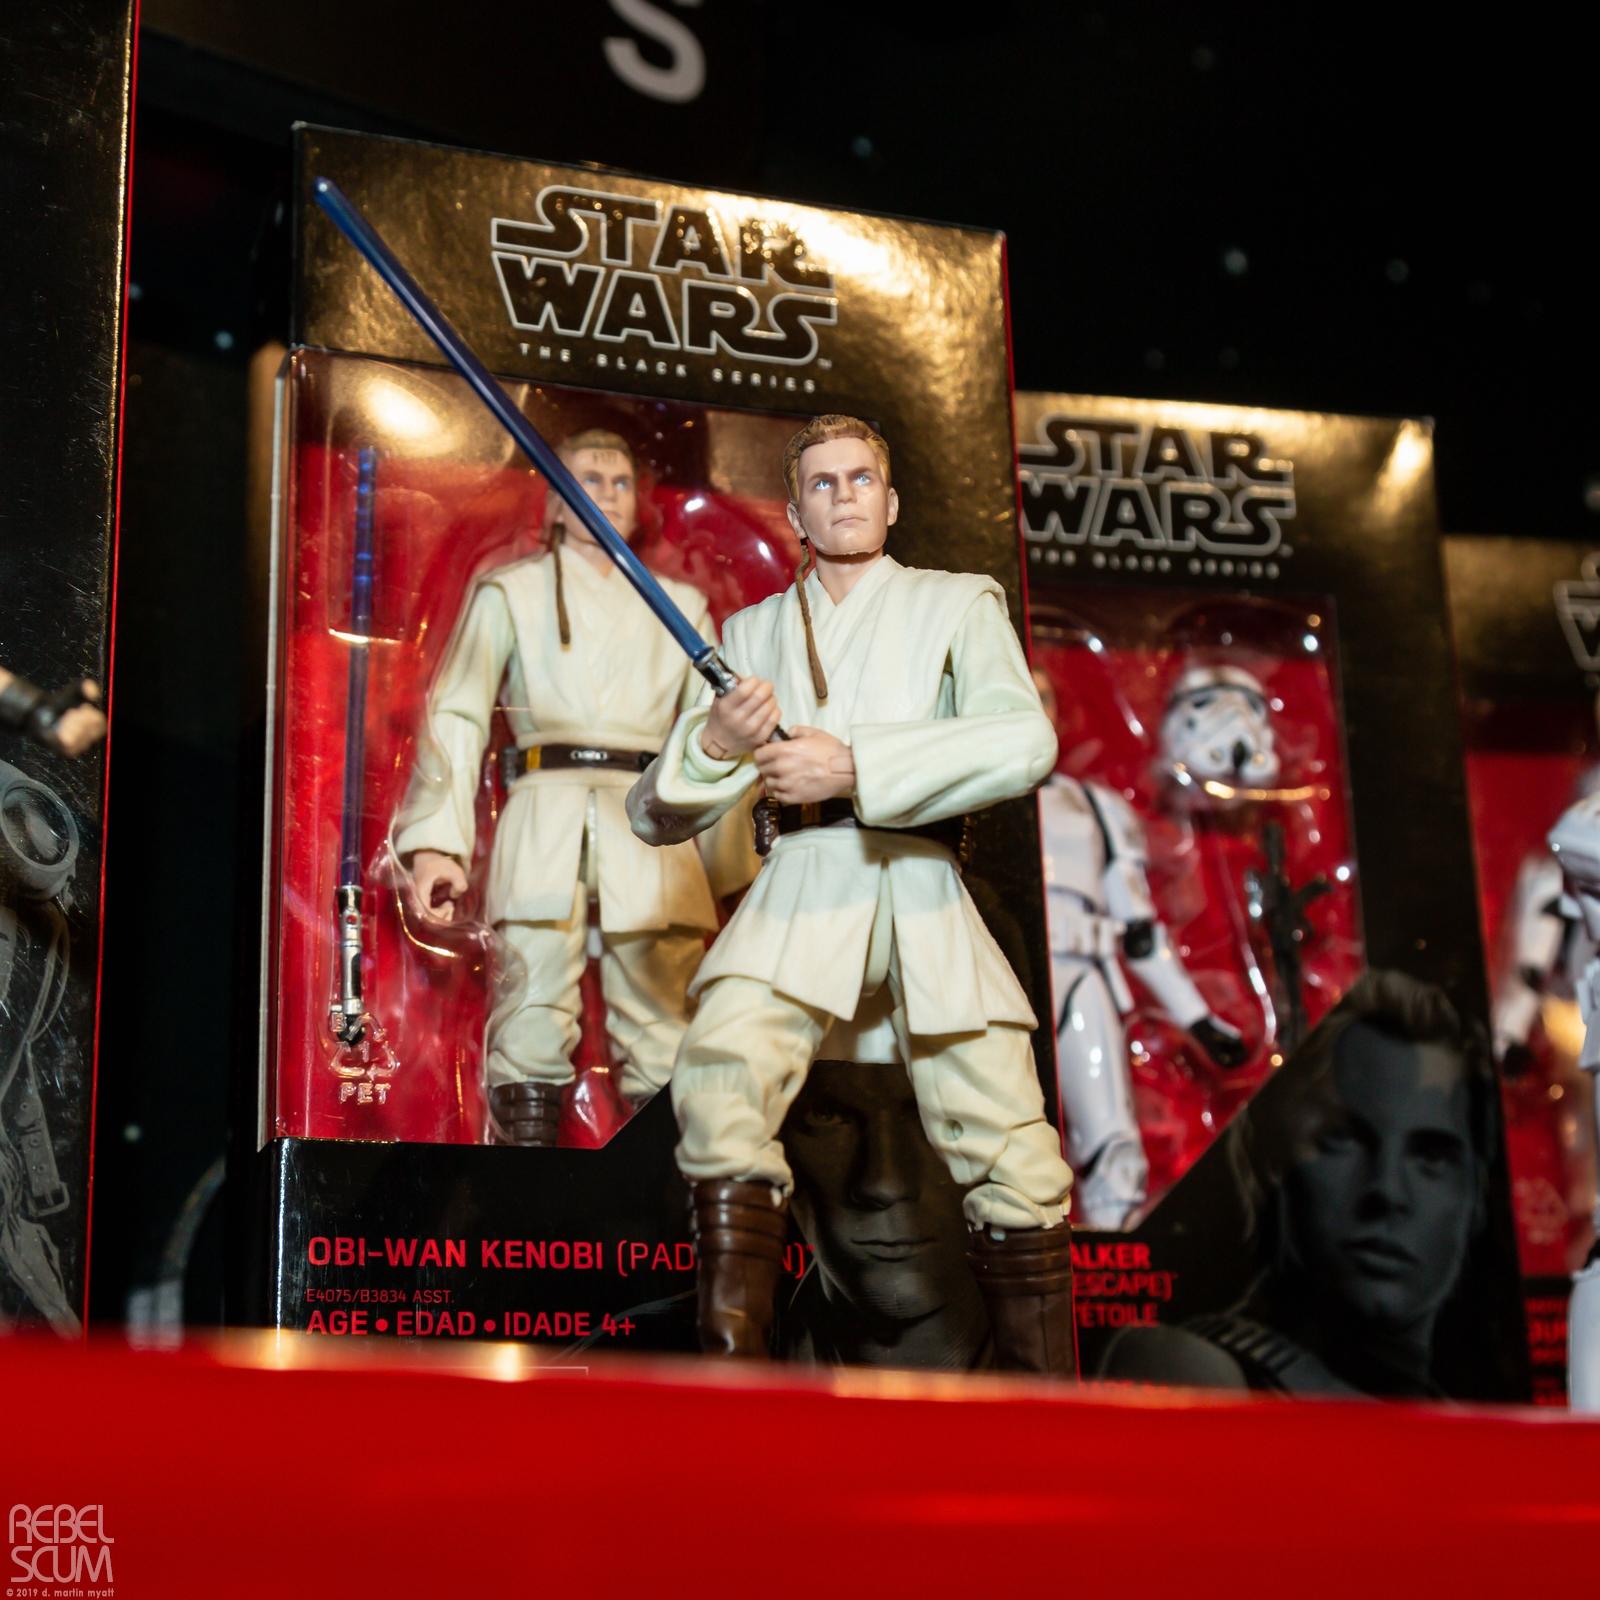 SW Obi-Wan Kenobi Black Series Figure